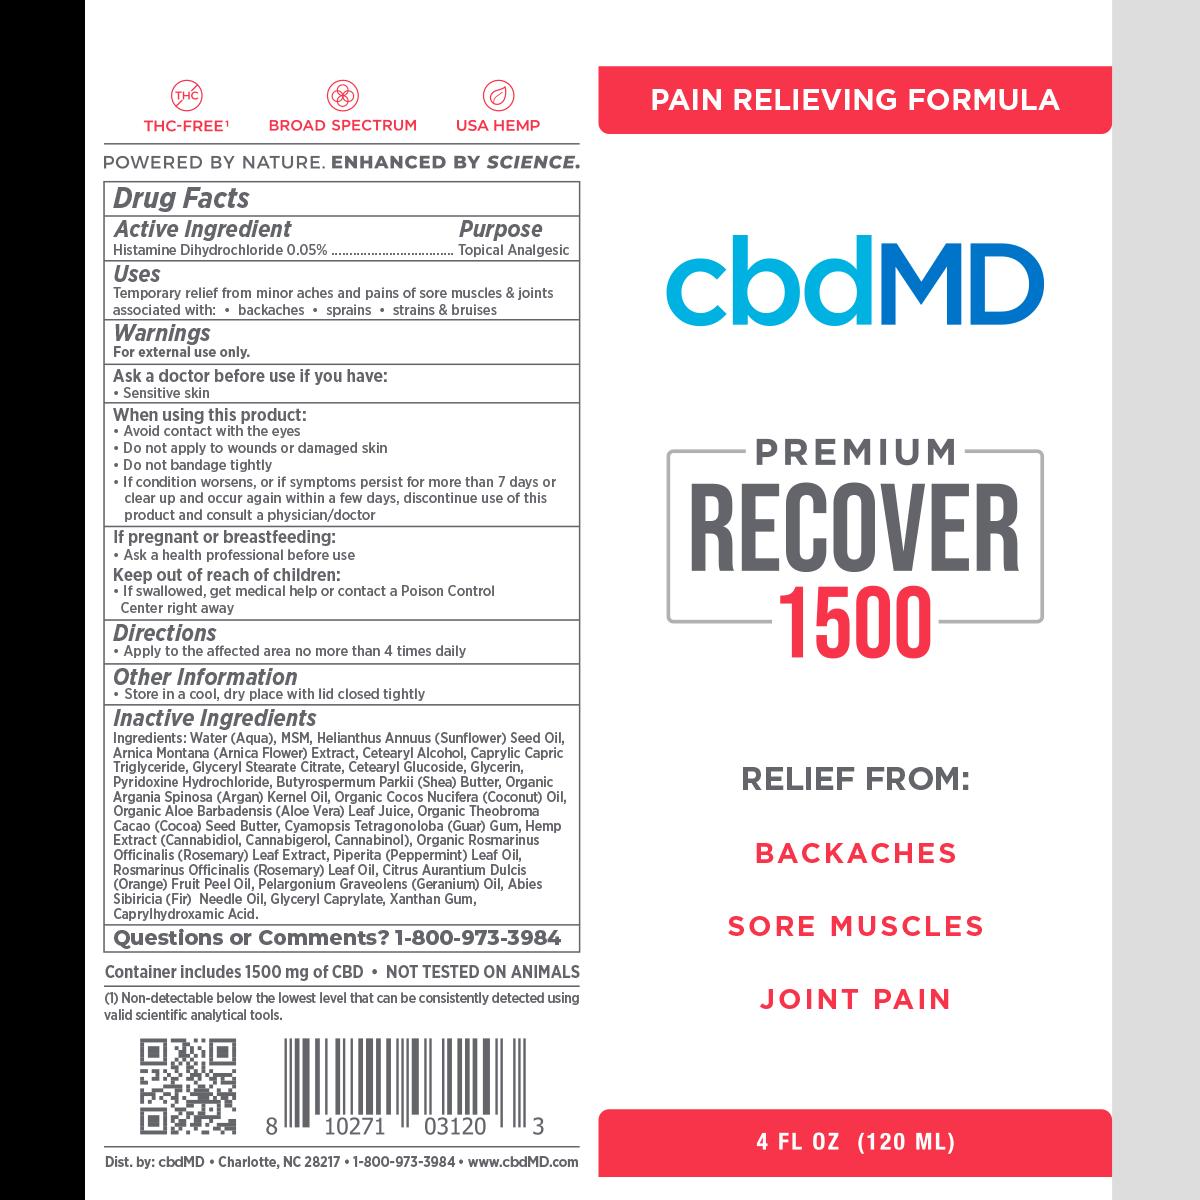 cbdMD | cbdMD INFLAMMATION RECOVER FORMULA | 3 LEVELS |